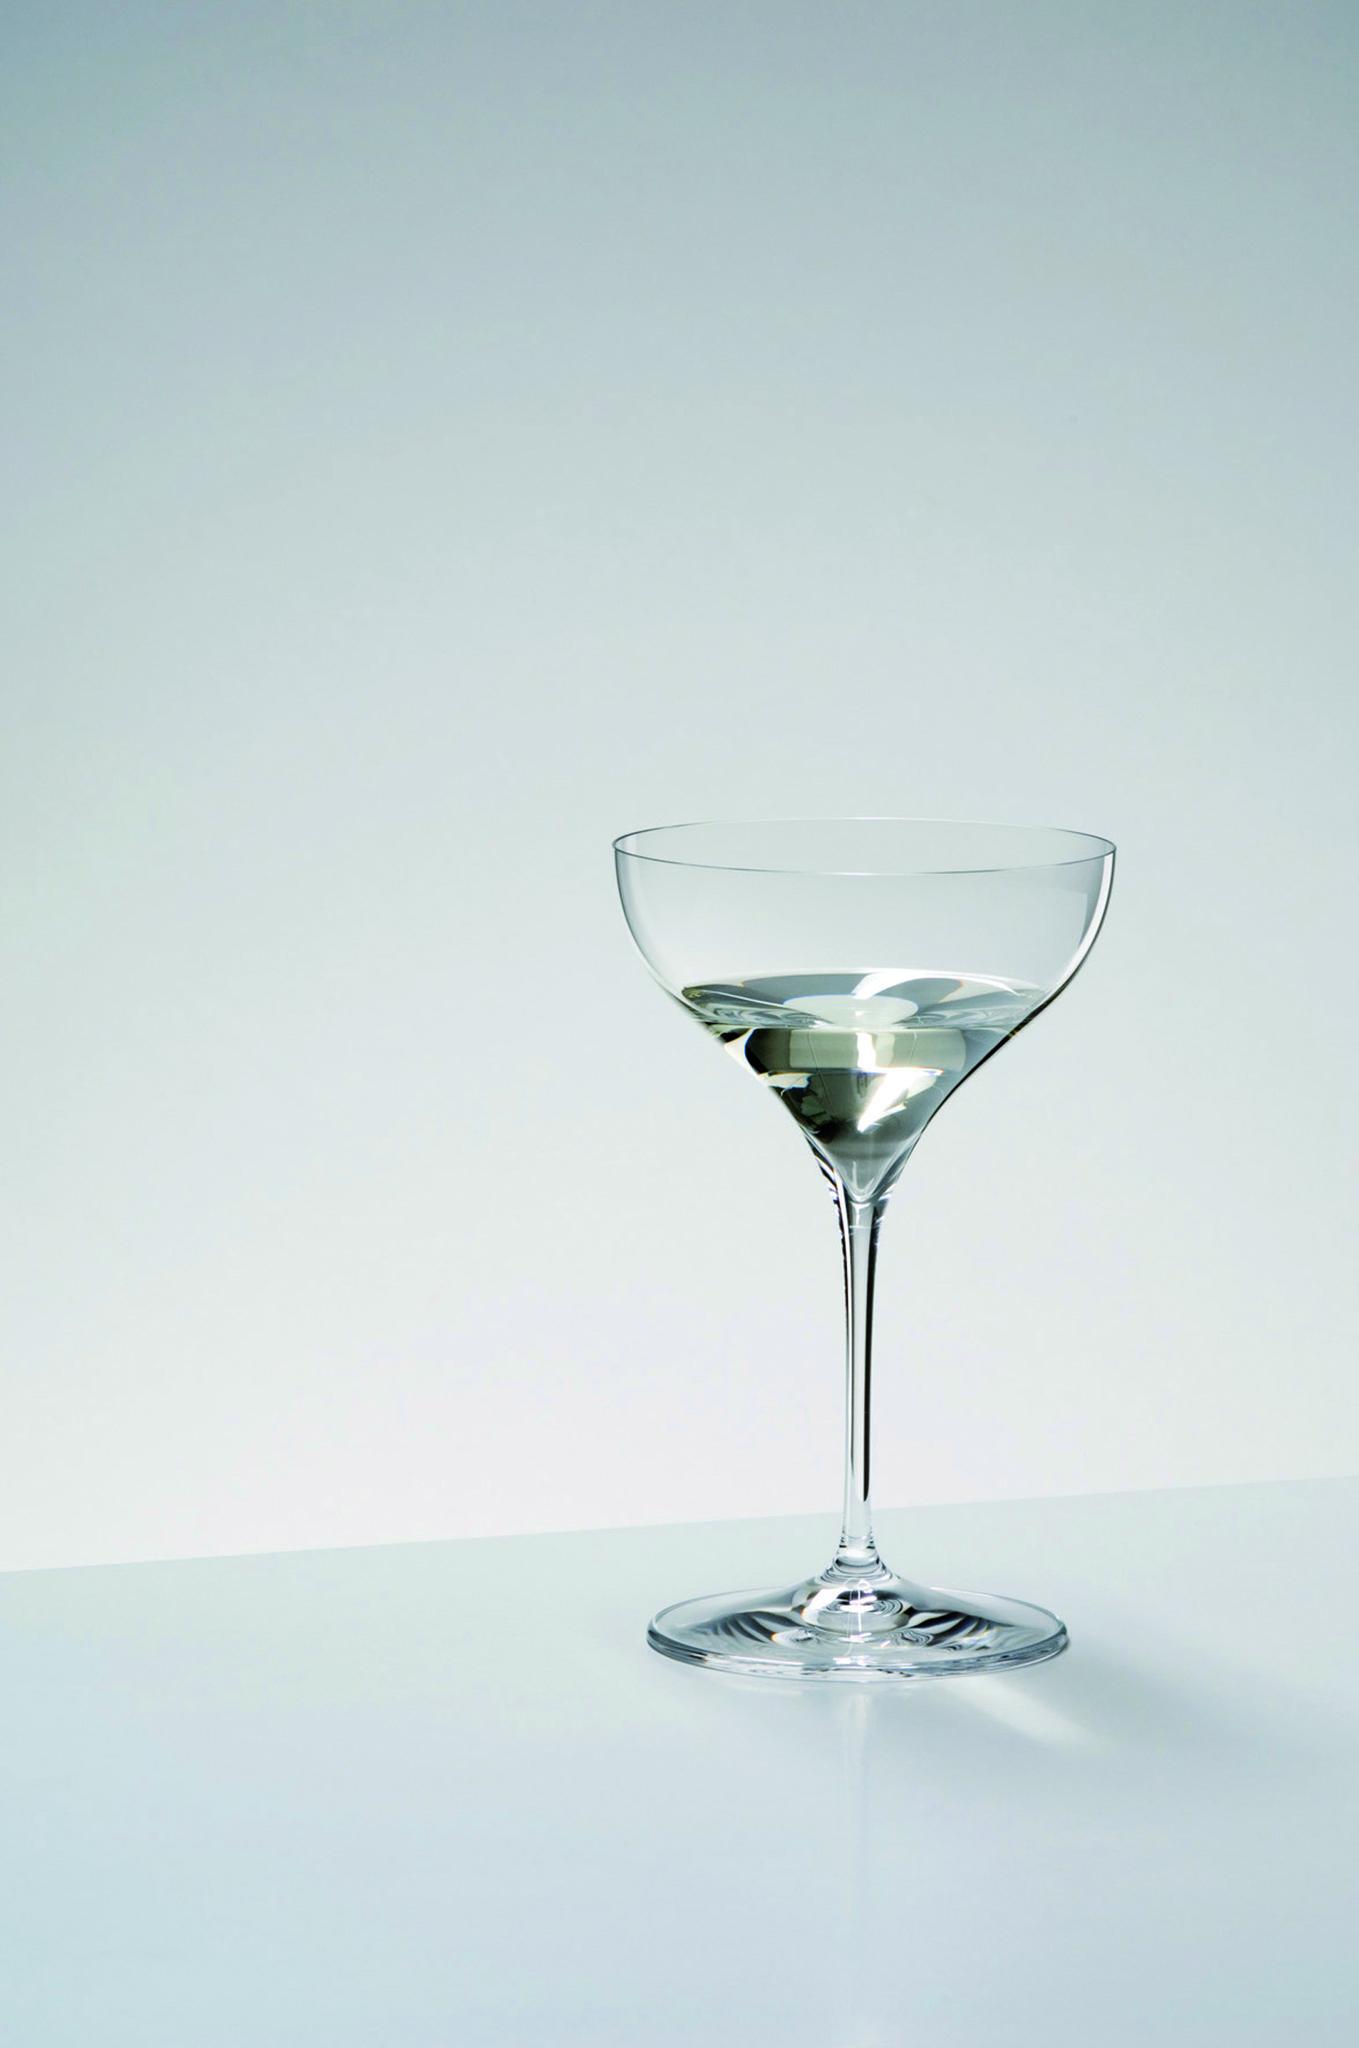 Бокалы Набор бокалов для мартини 2 шт 275 мл Riedel Grape@Riedel Martini nabor-bokalov-dlya-martini-2-sht-275-ml-riedel-graperiedel-martini-avstriya.jpg